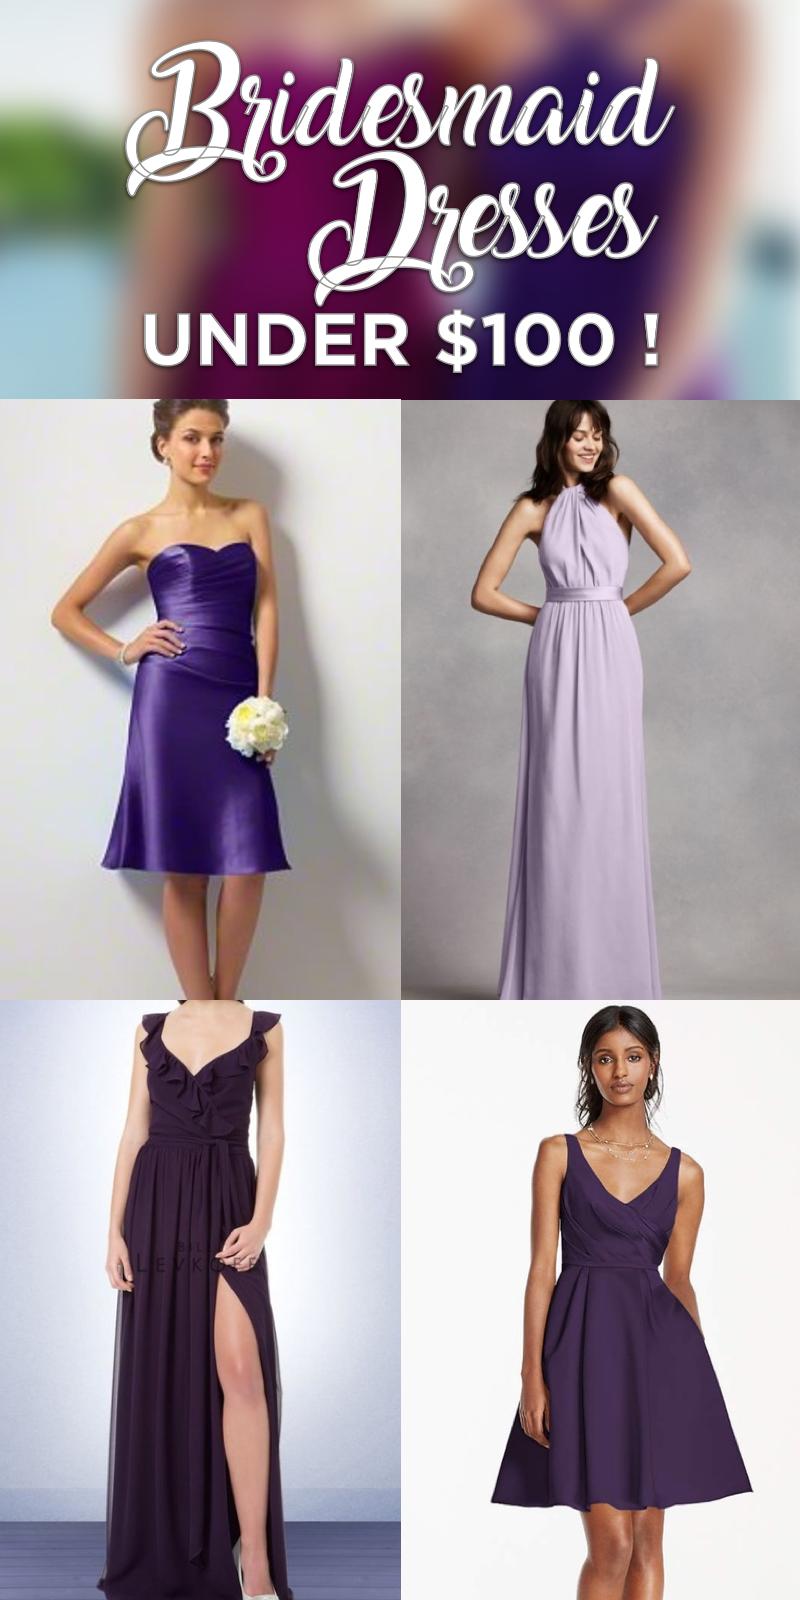 Bridesmaid dresses under 100 list an item or make an offer buy bridesmaid dresses under 100 list an item or make an offer buy sell ombrellifo Image collections